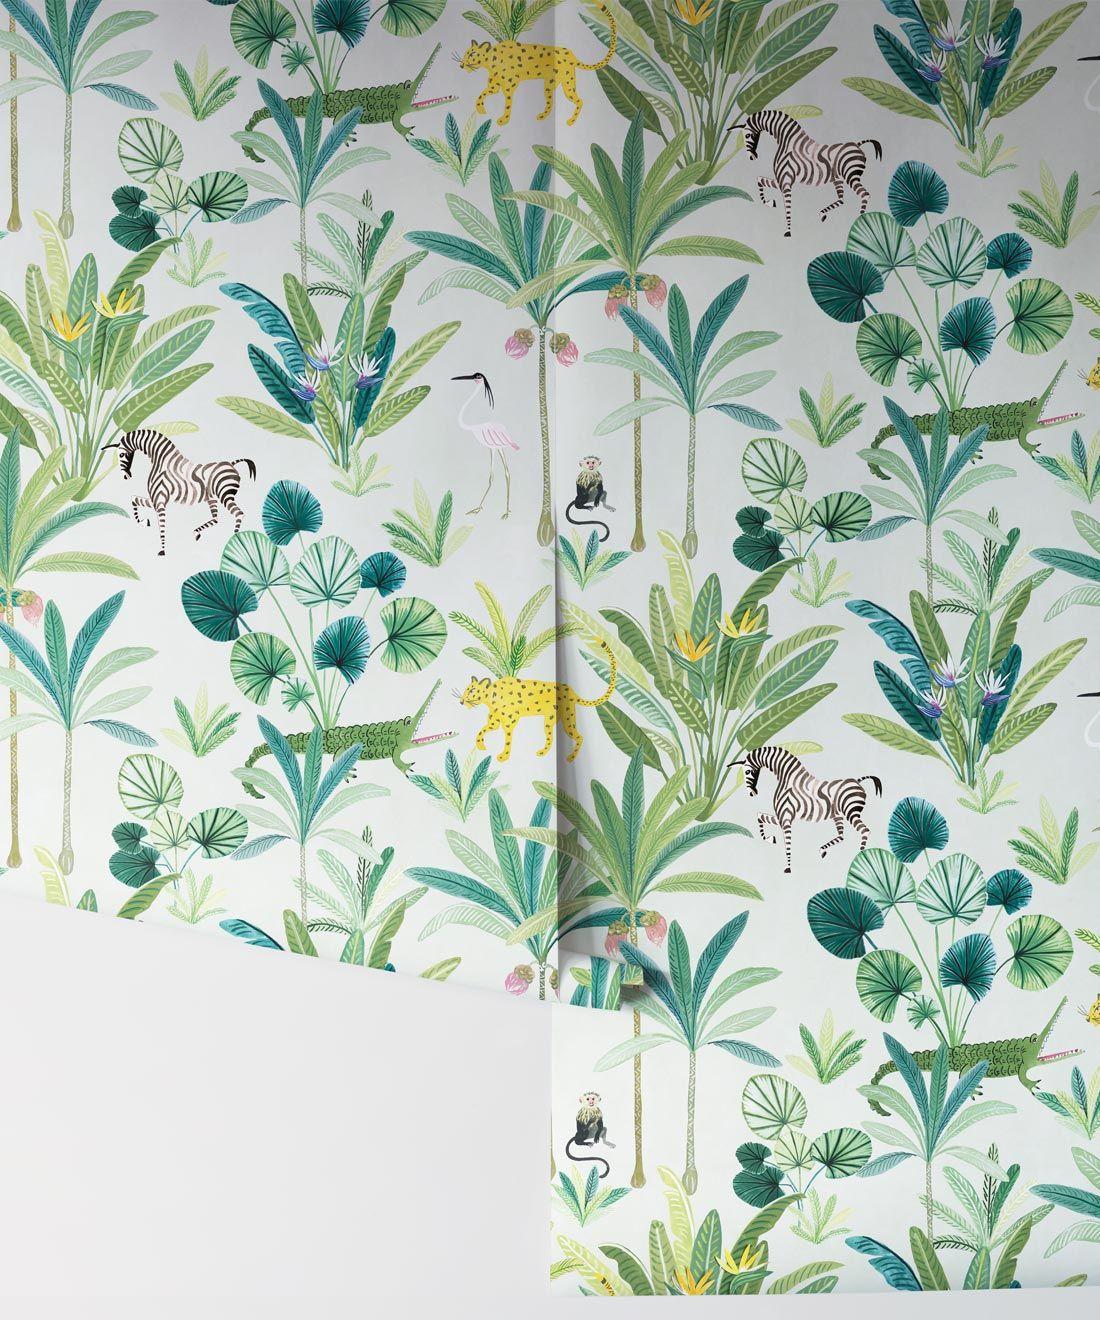 Jungle Wallpaper • Animal Kingdom Tropical